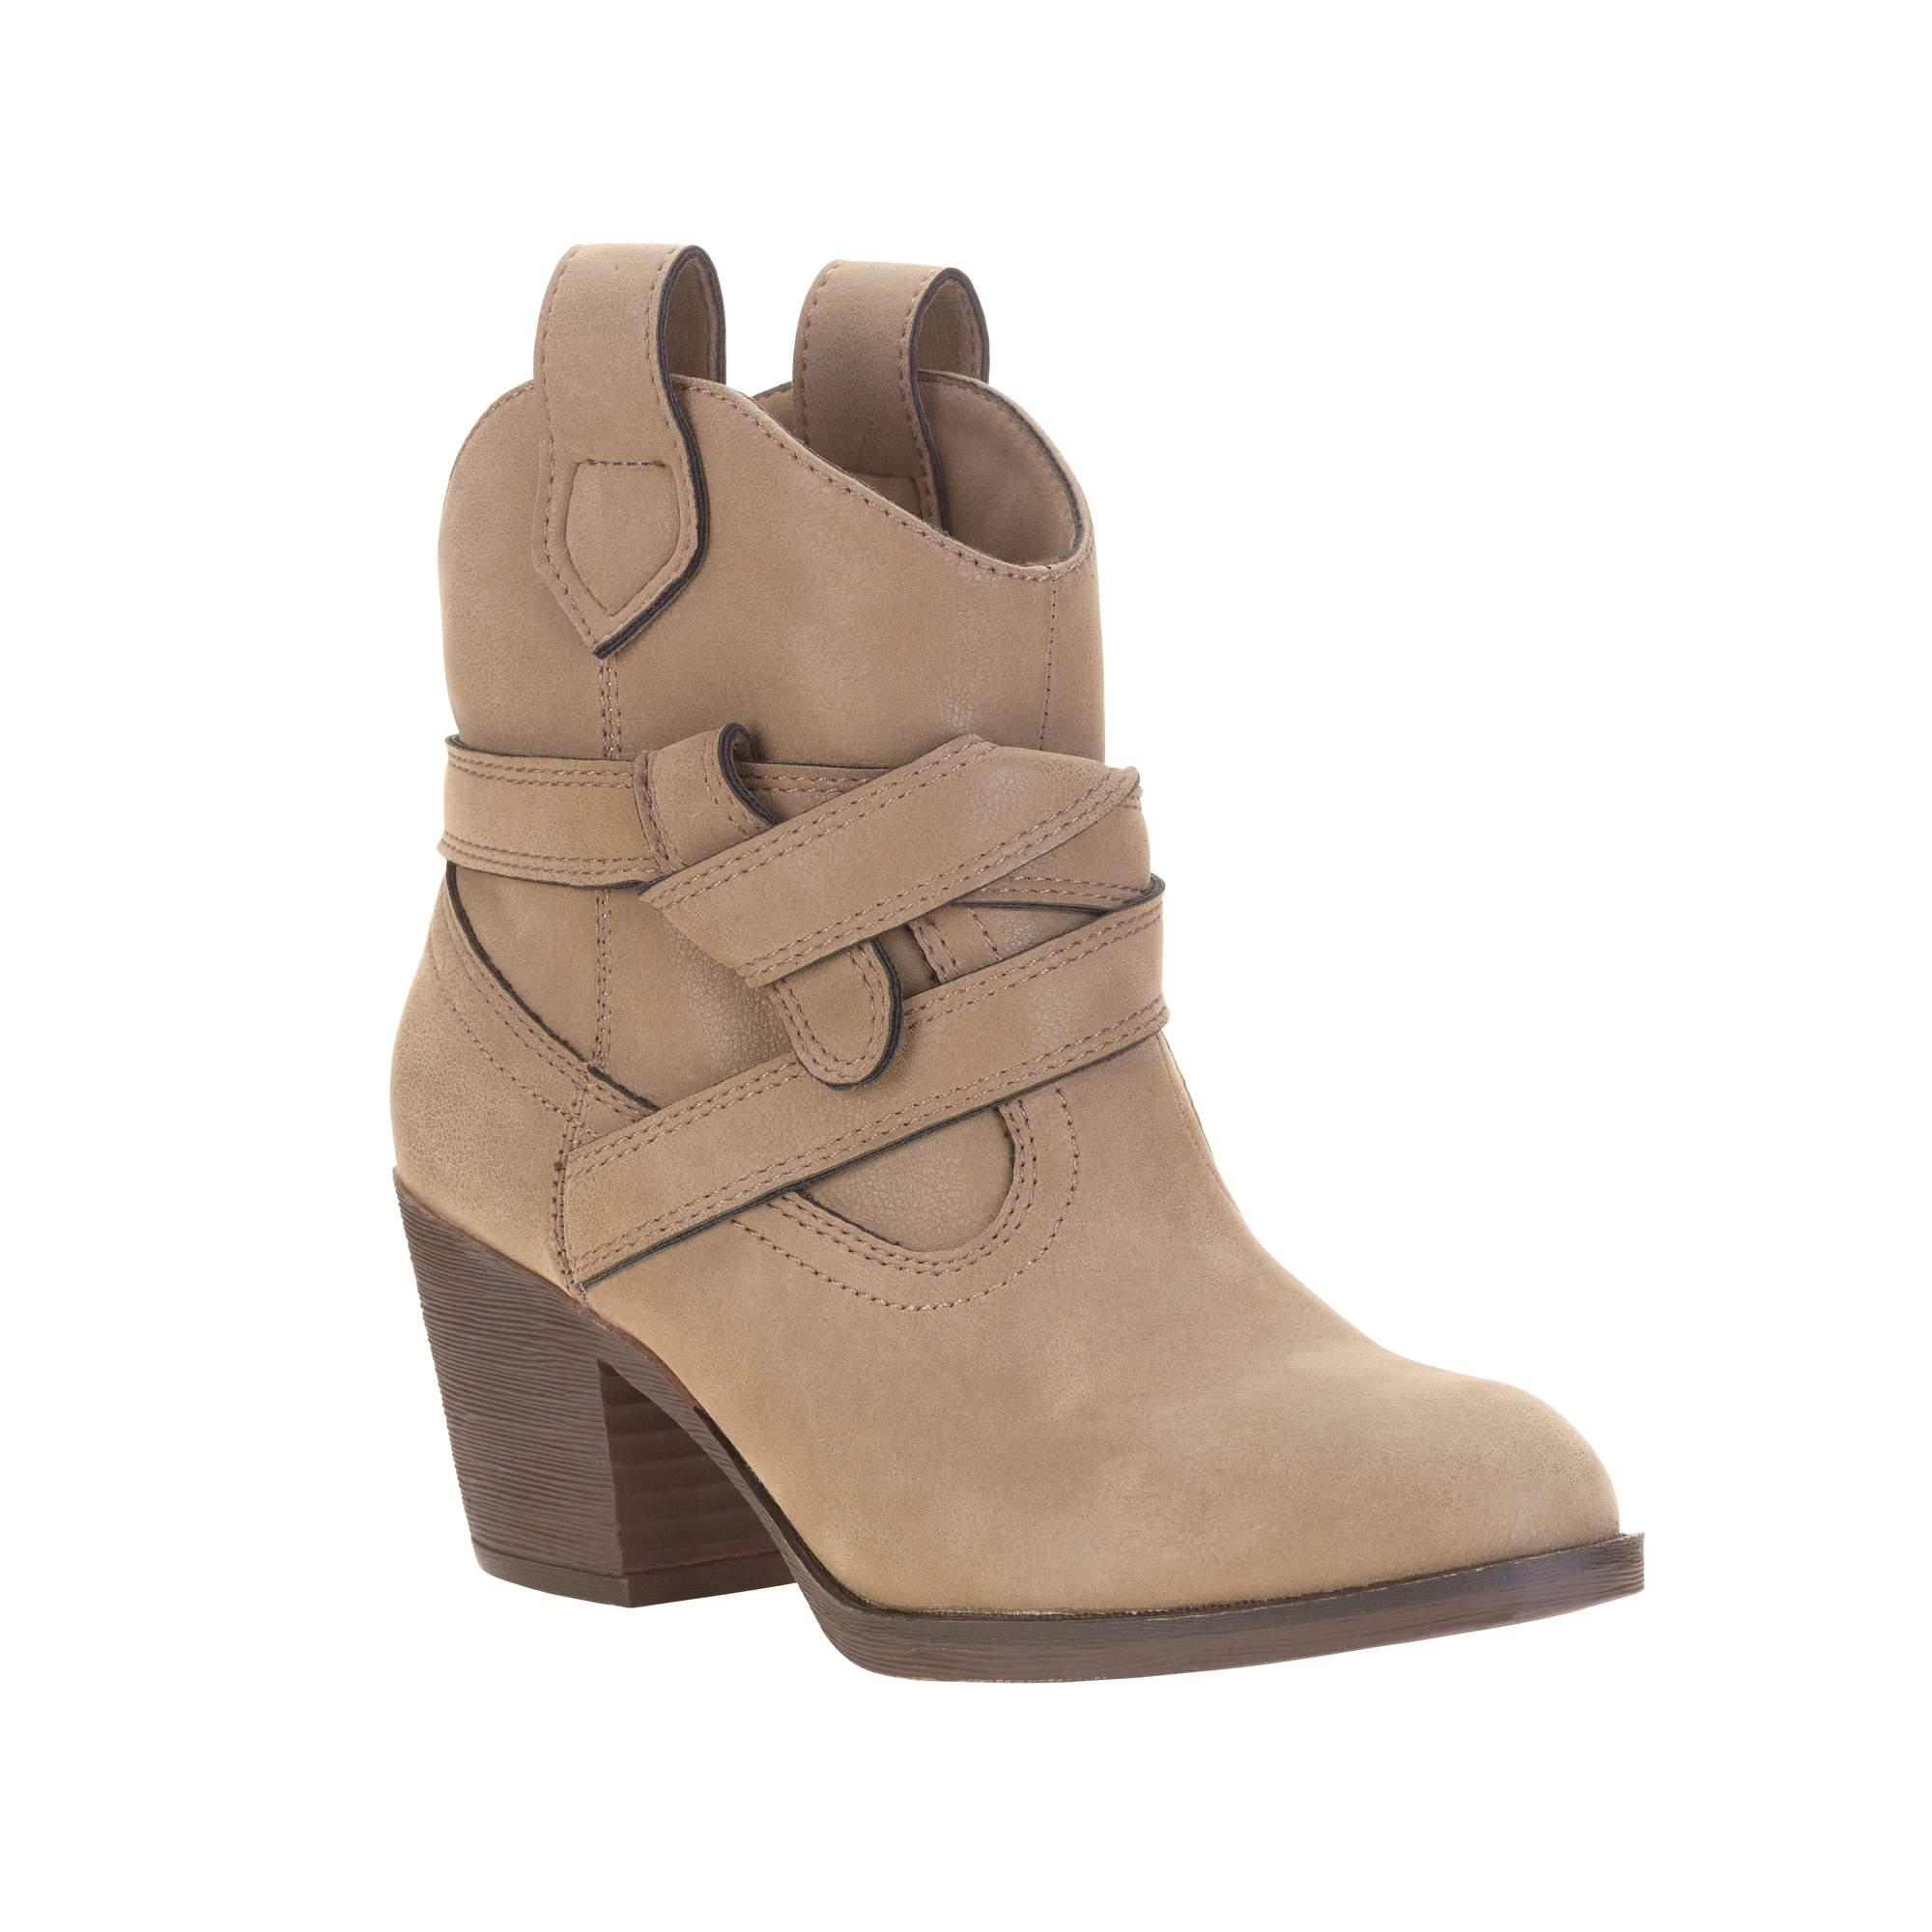 Stella Chase Women's Sevah Boot Size: 8.5